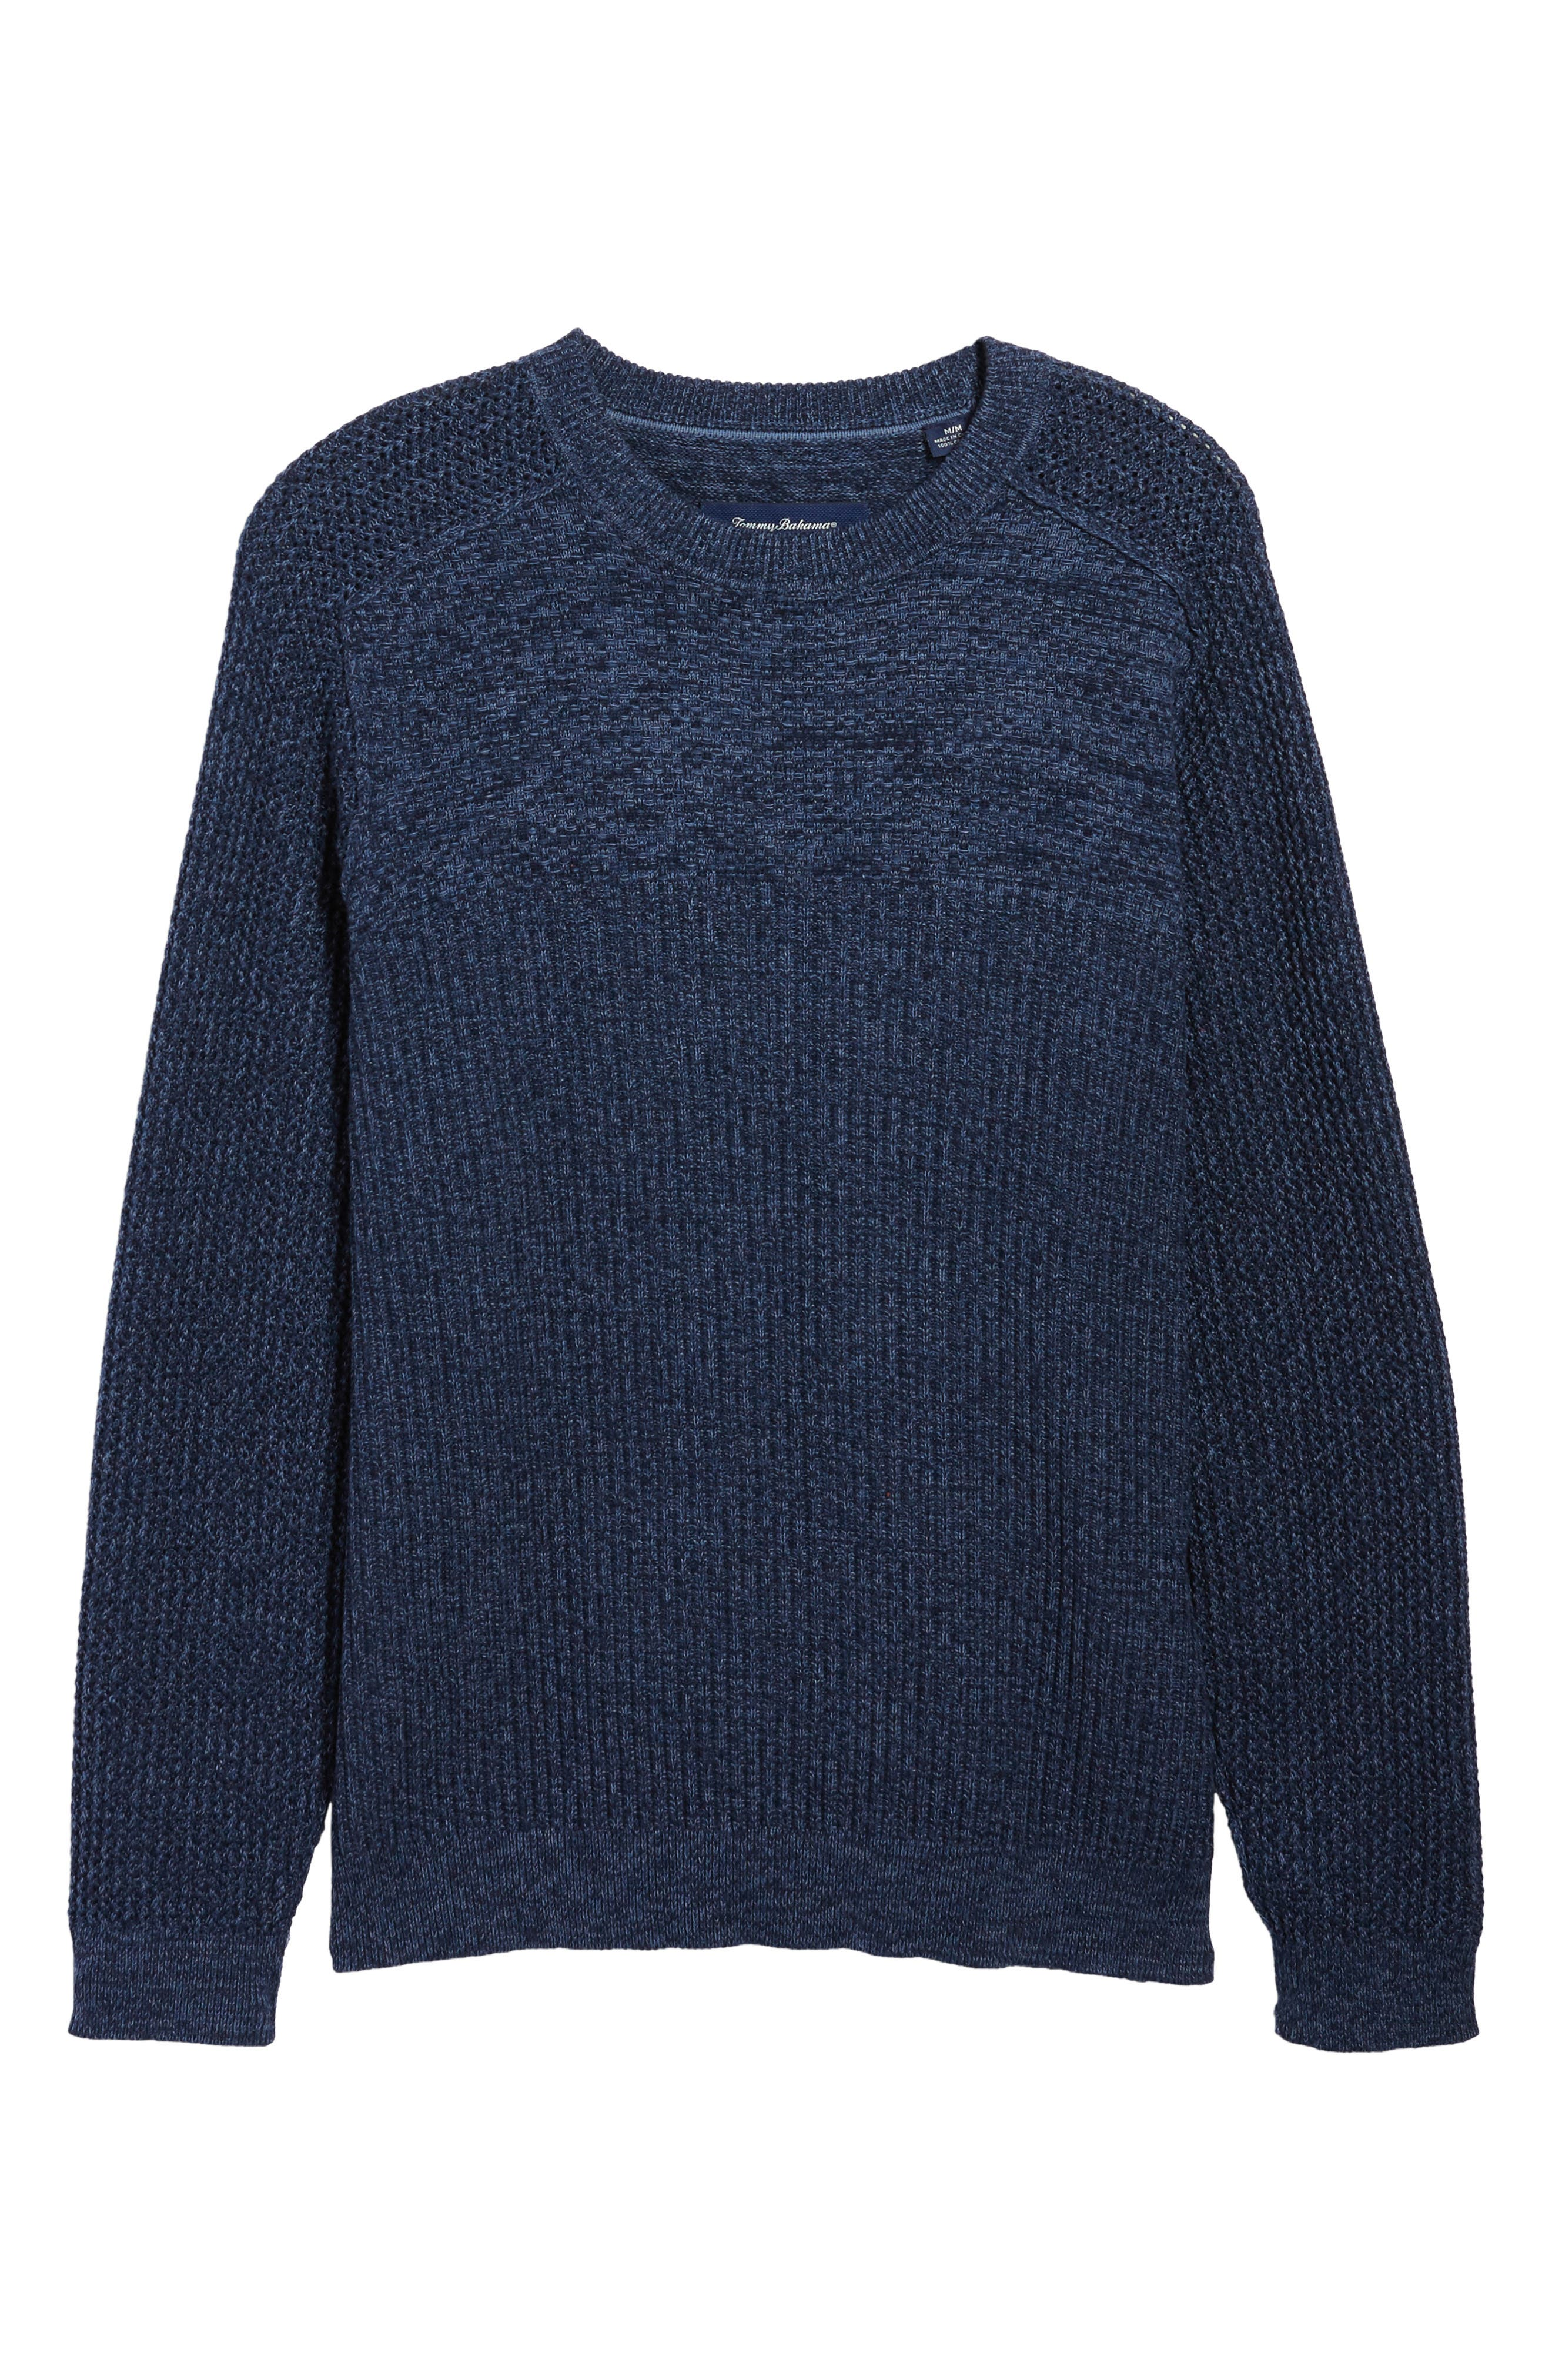 Medina Marl Cotton Sweater,                             Alternate thumbnail 6, color,                             001